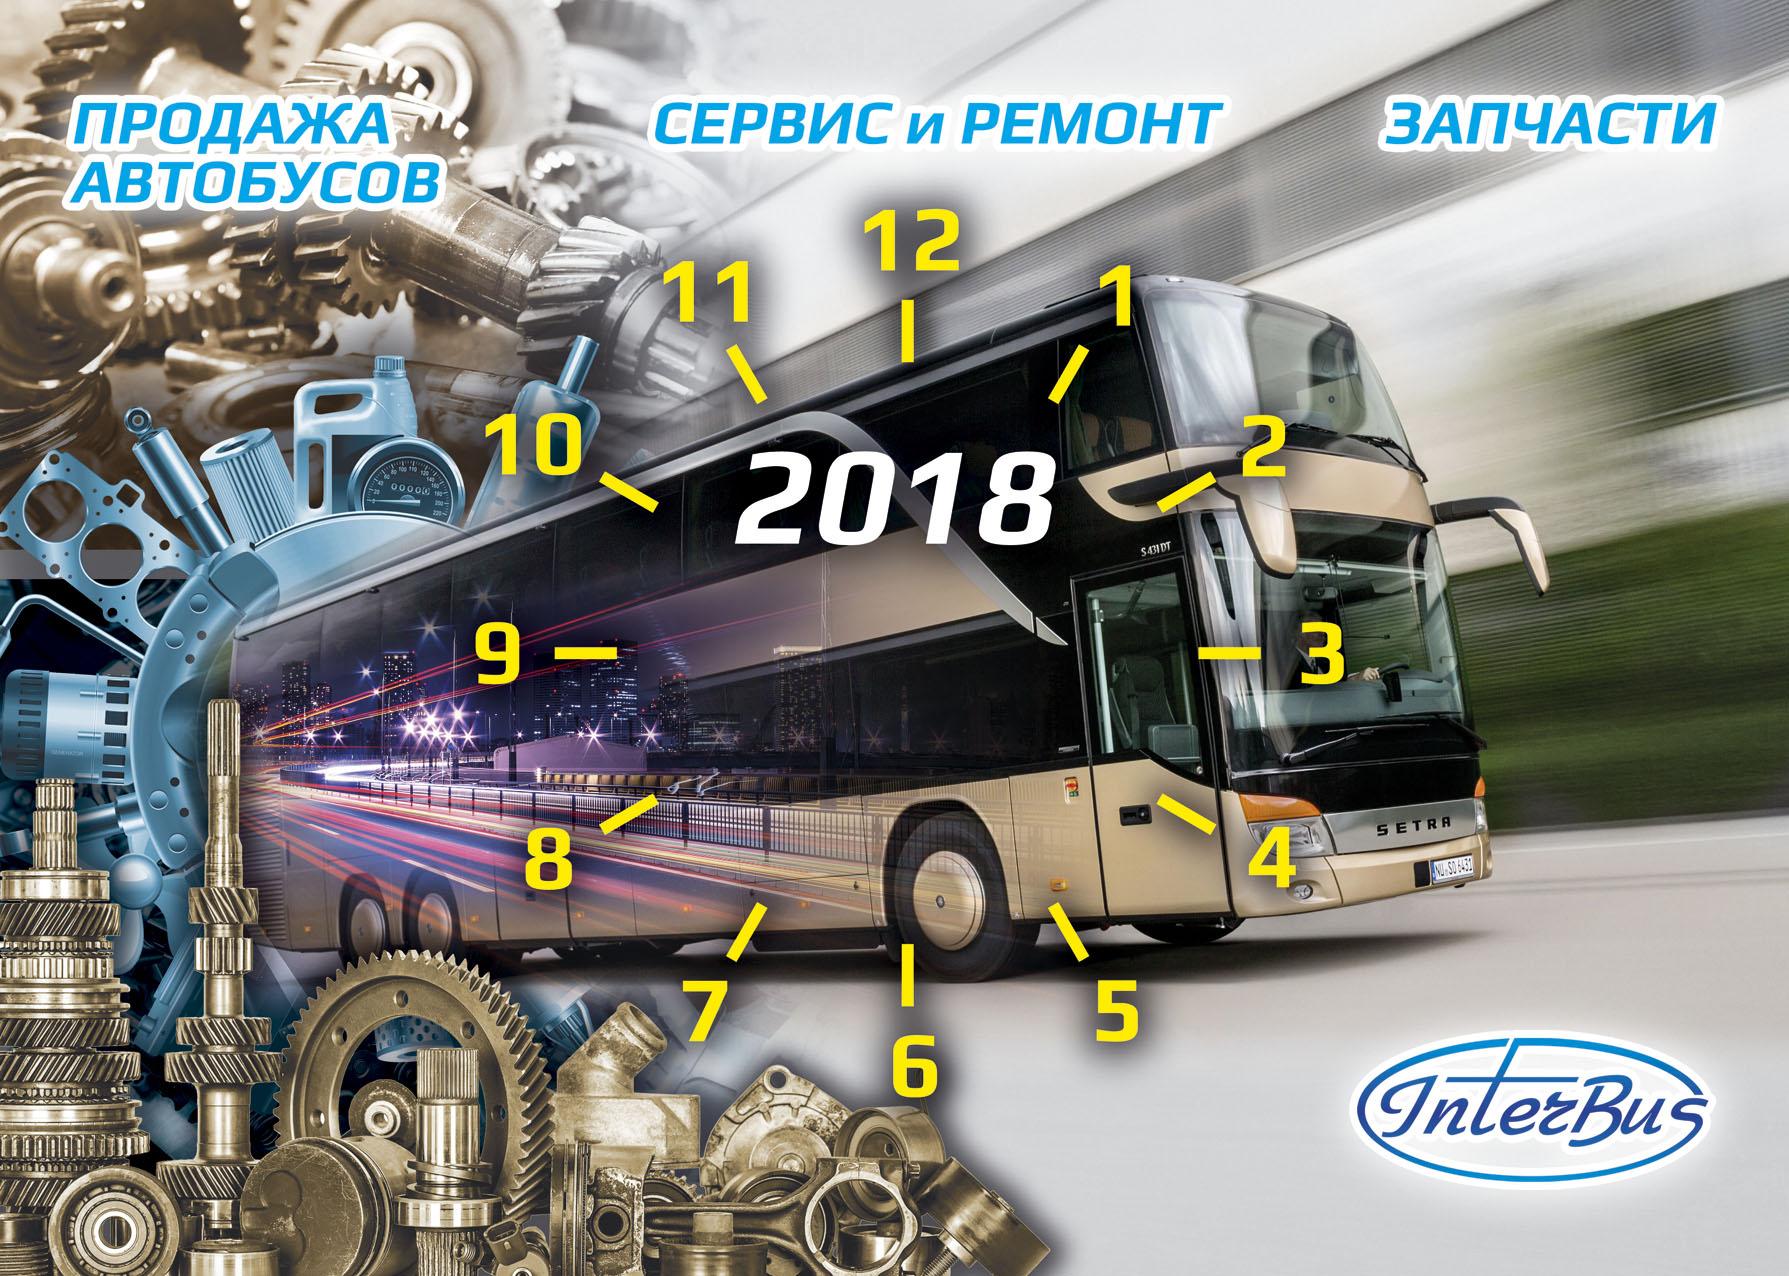 (01) Интербус 2018 Shapka 04